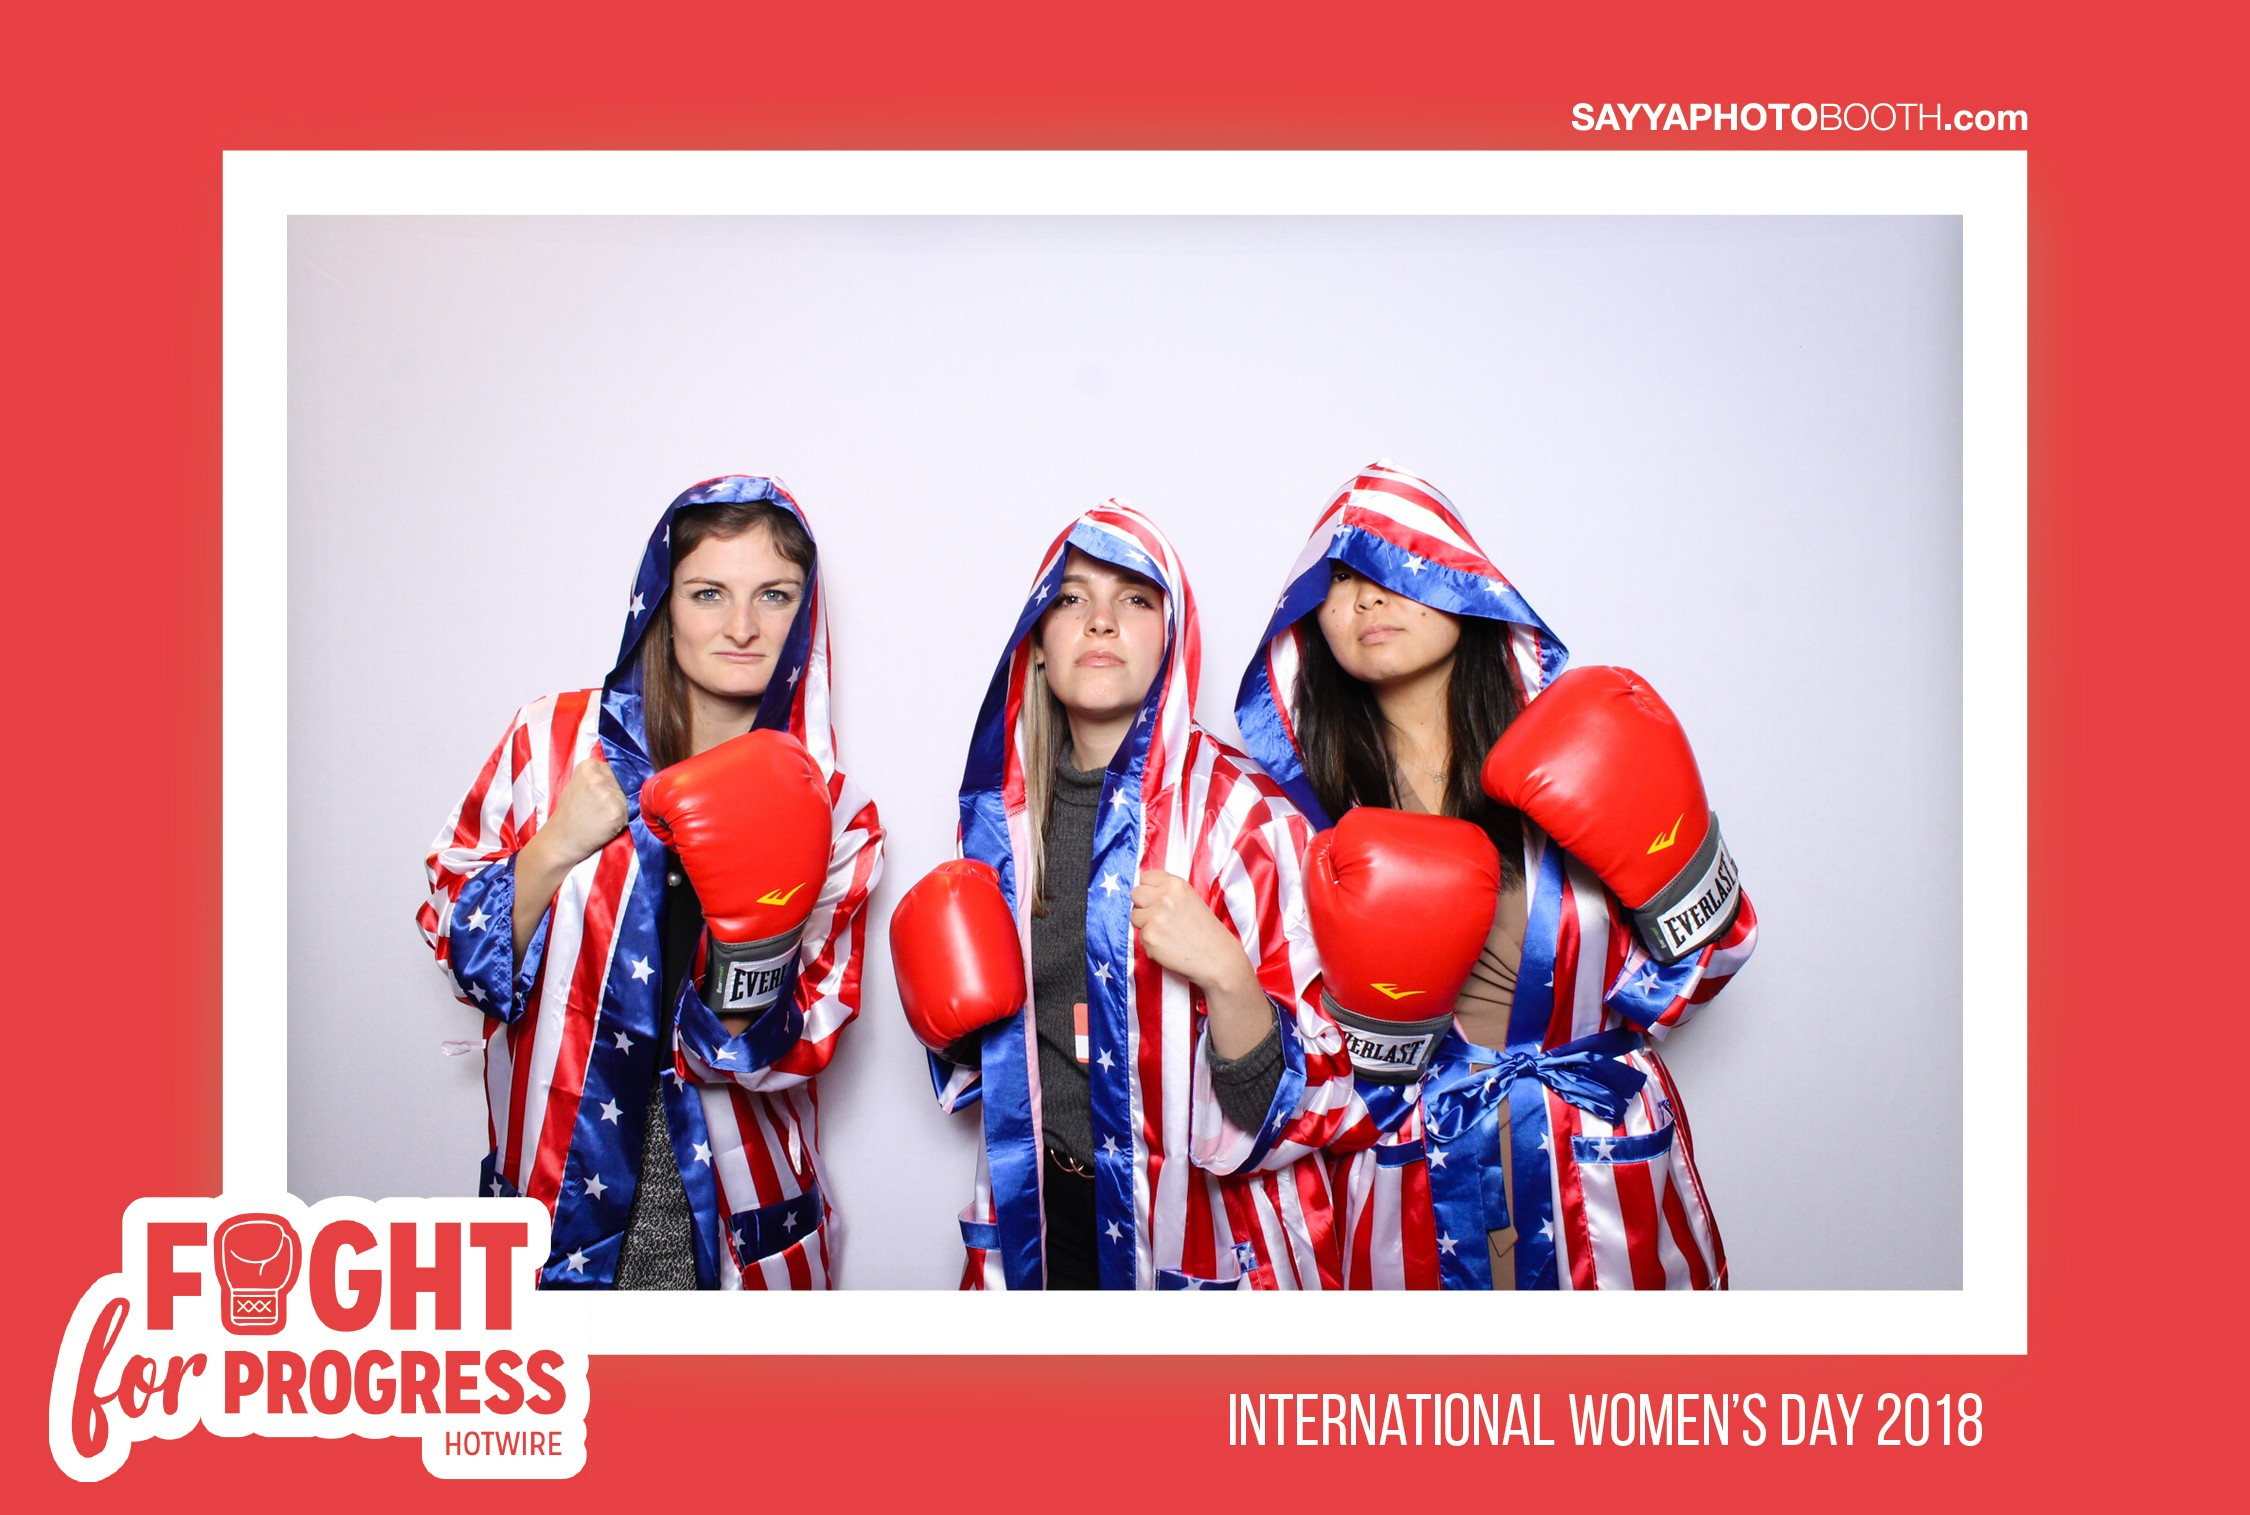 Hotwire's International Women's Day